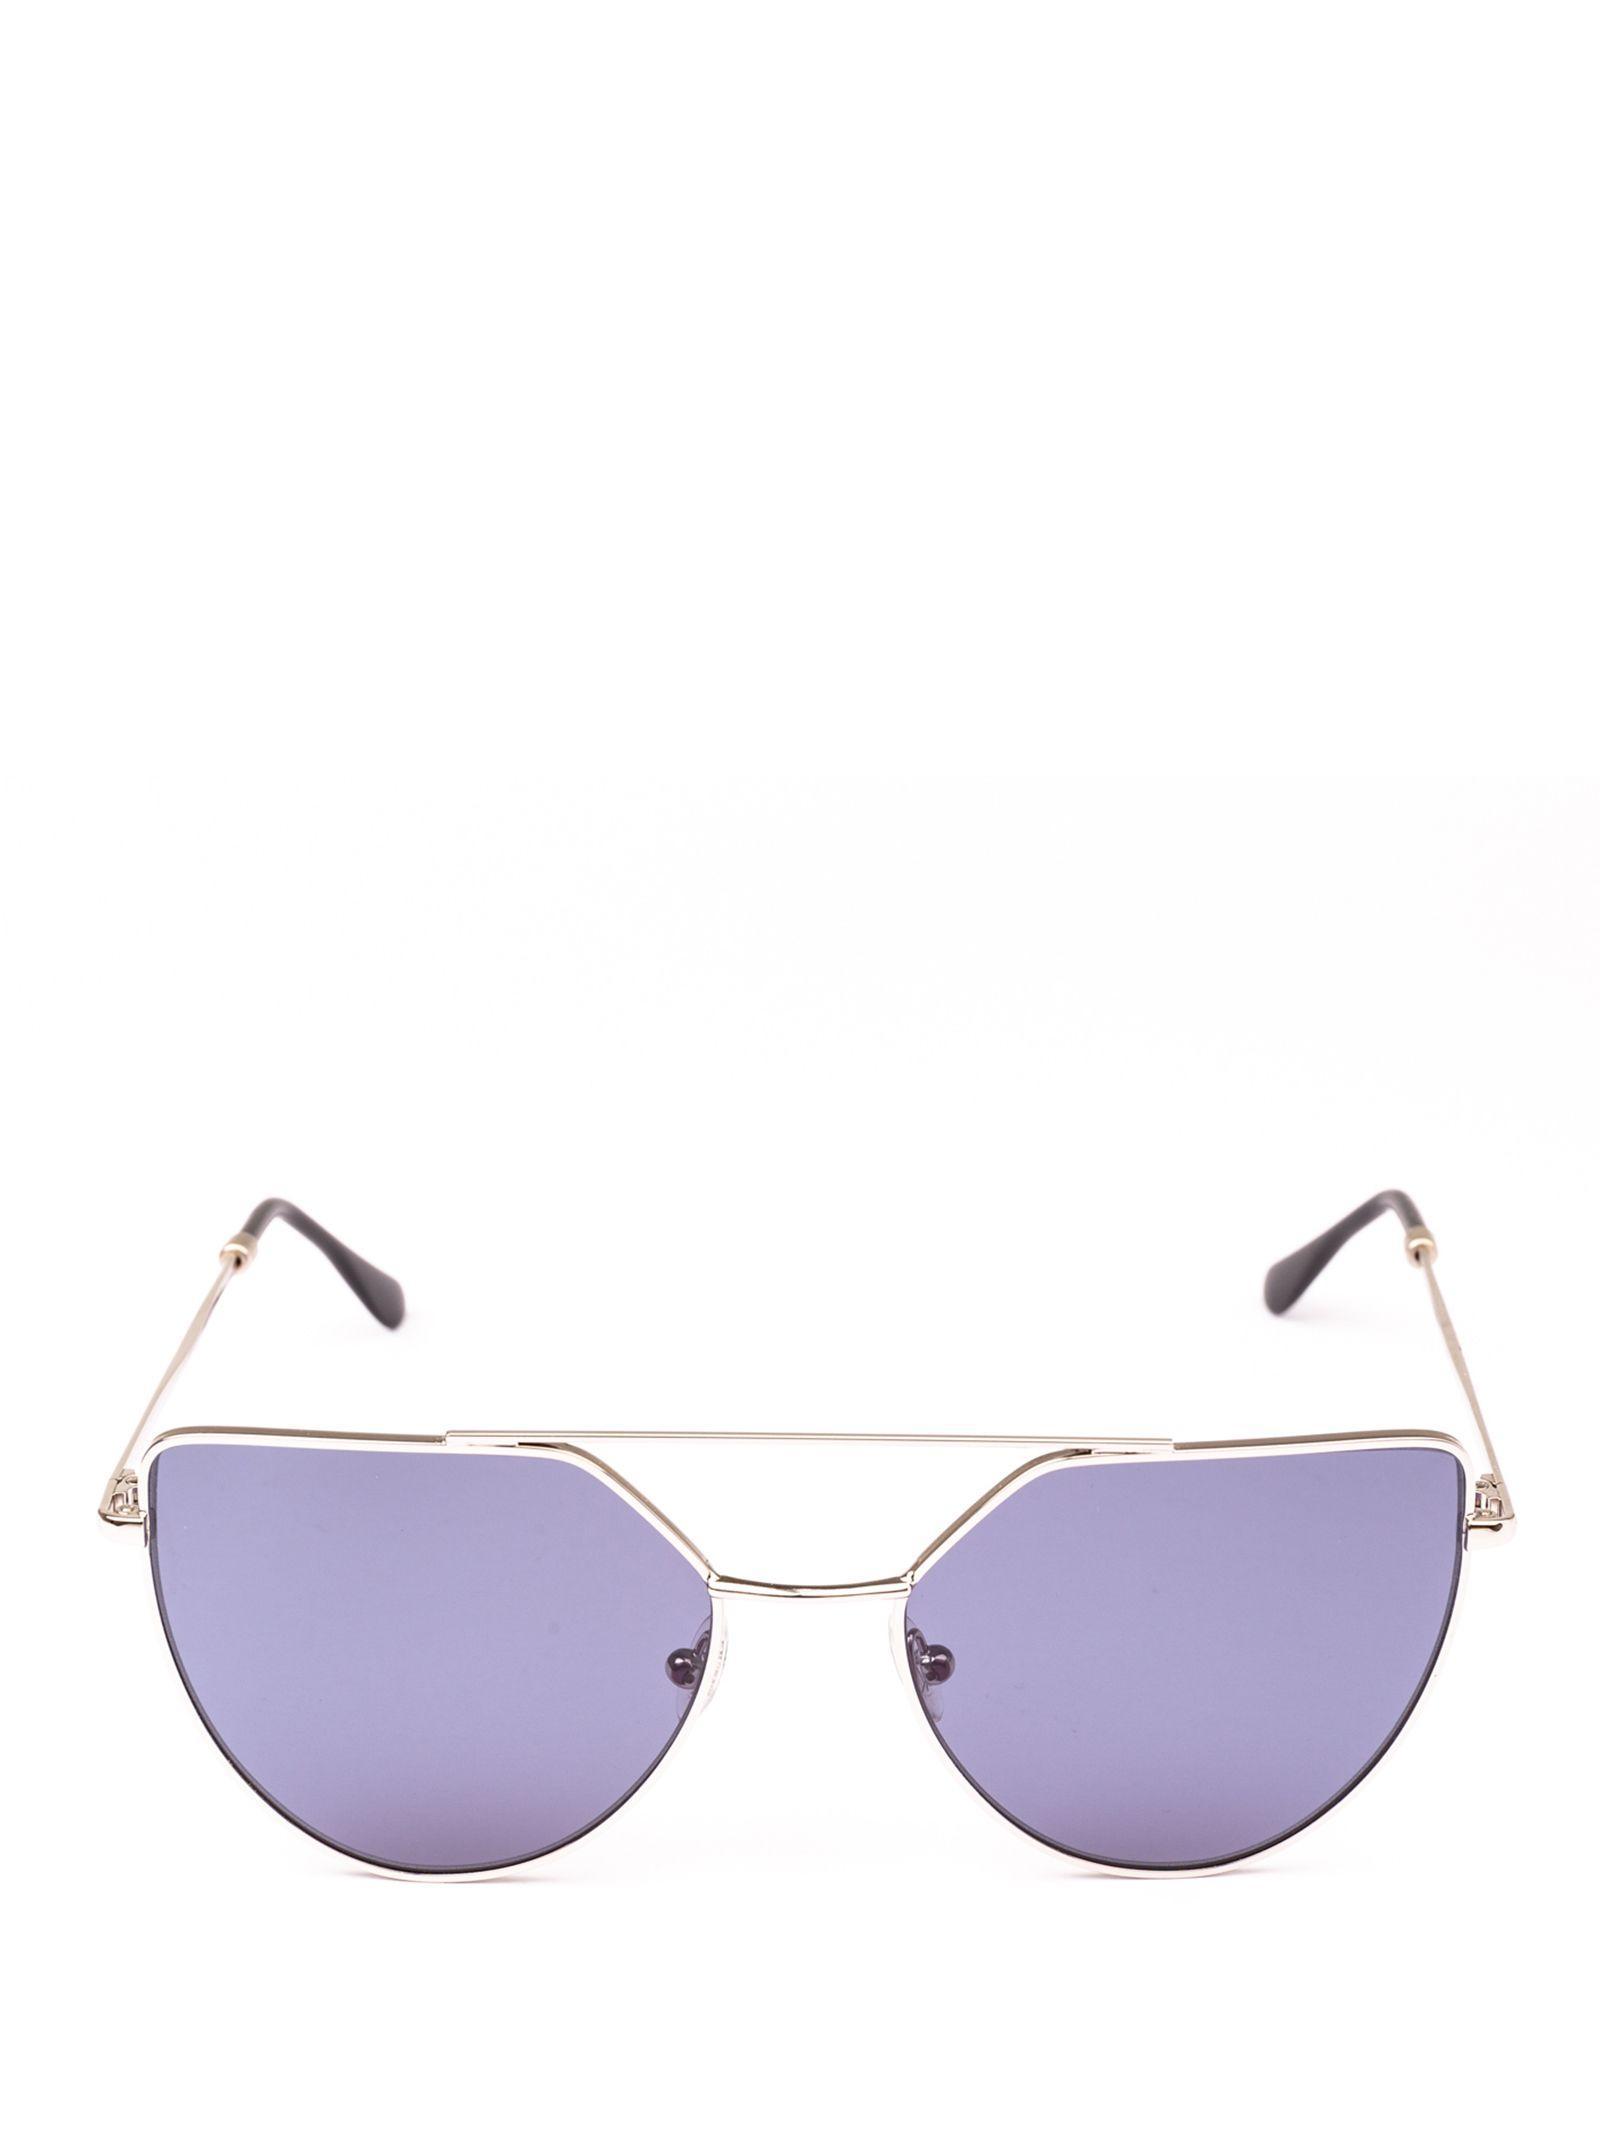 SPEKTRE Sunglasses in Osd04Aft